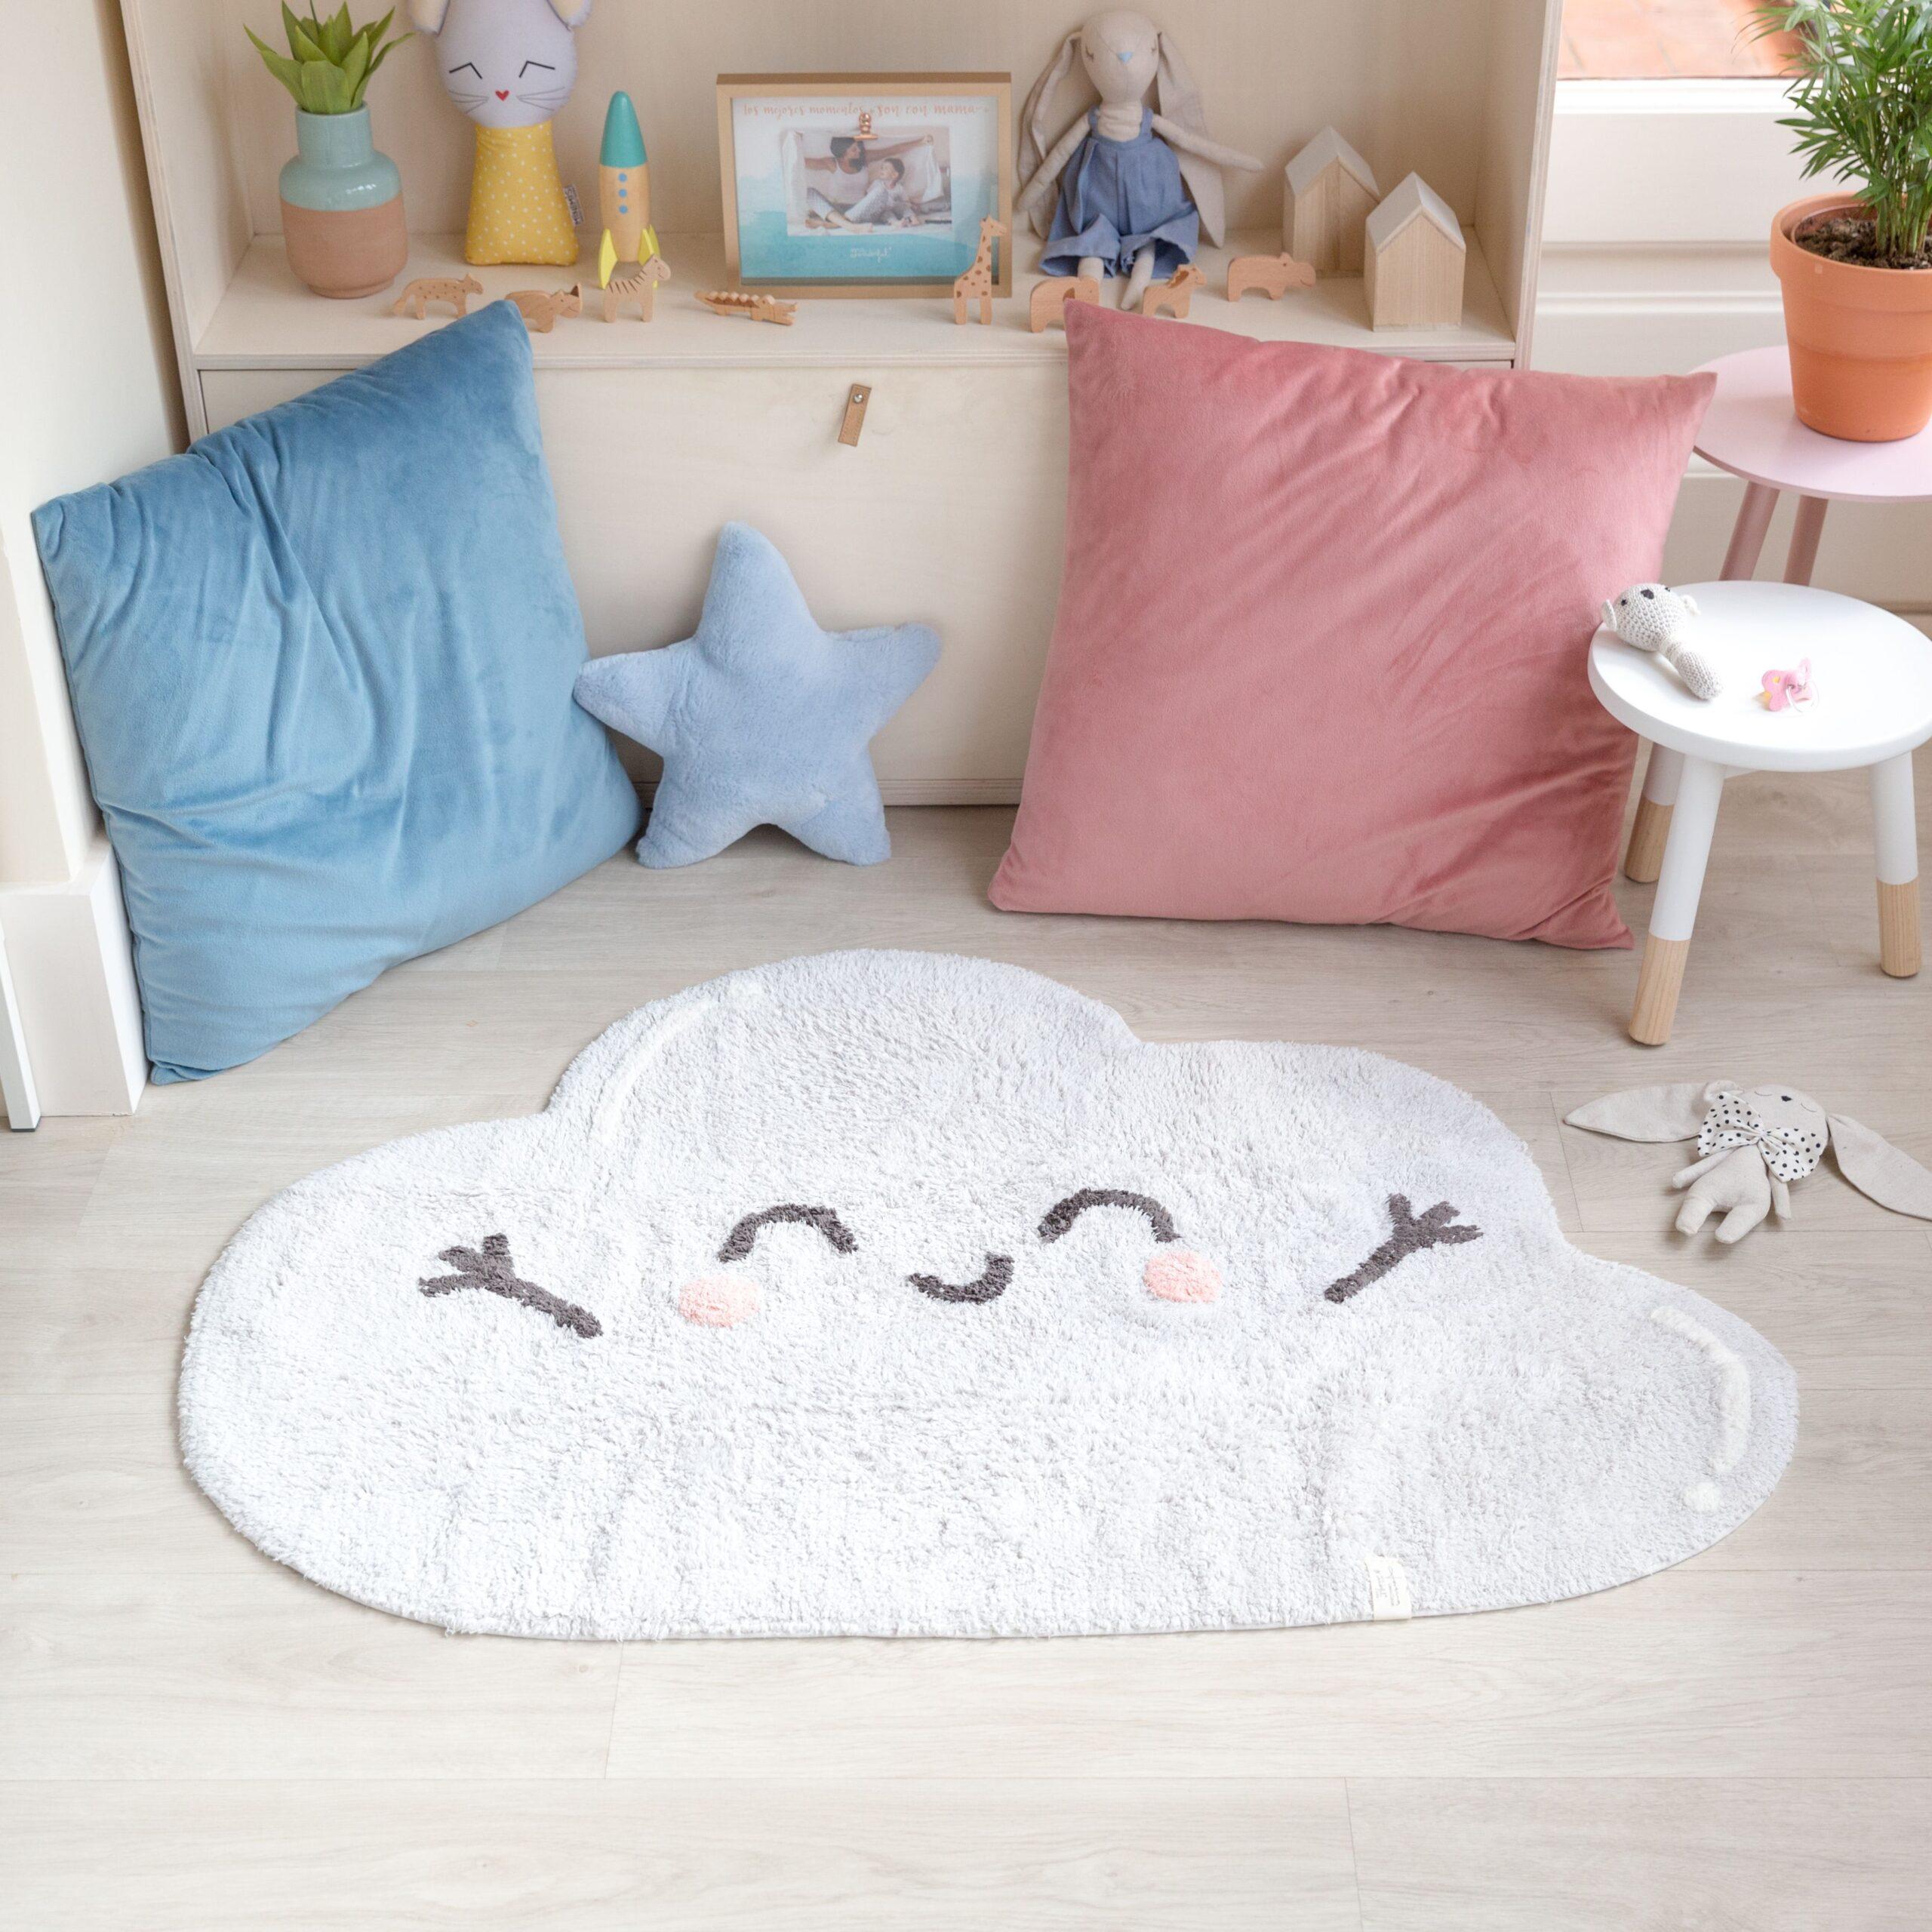 Full Size of Teppichboden Kinderzimmer Lorena Canals Teppich Happy Cloud Regal Weiß Regale Sofa Kinderzimmer Teppichboden Kinderzimmer